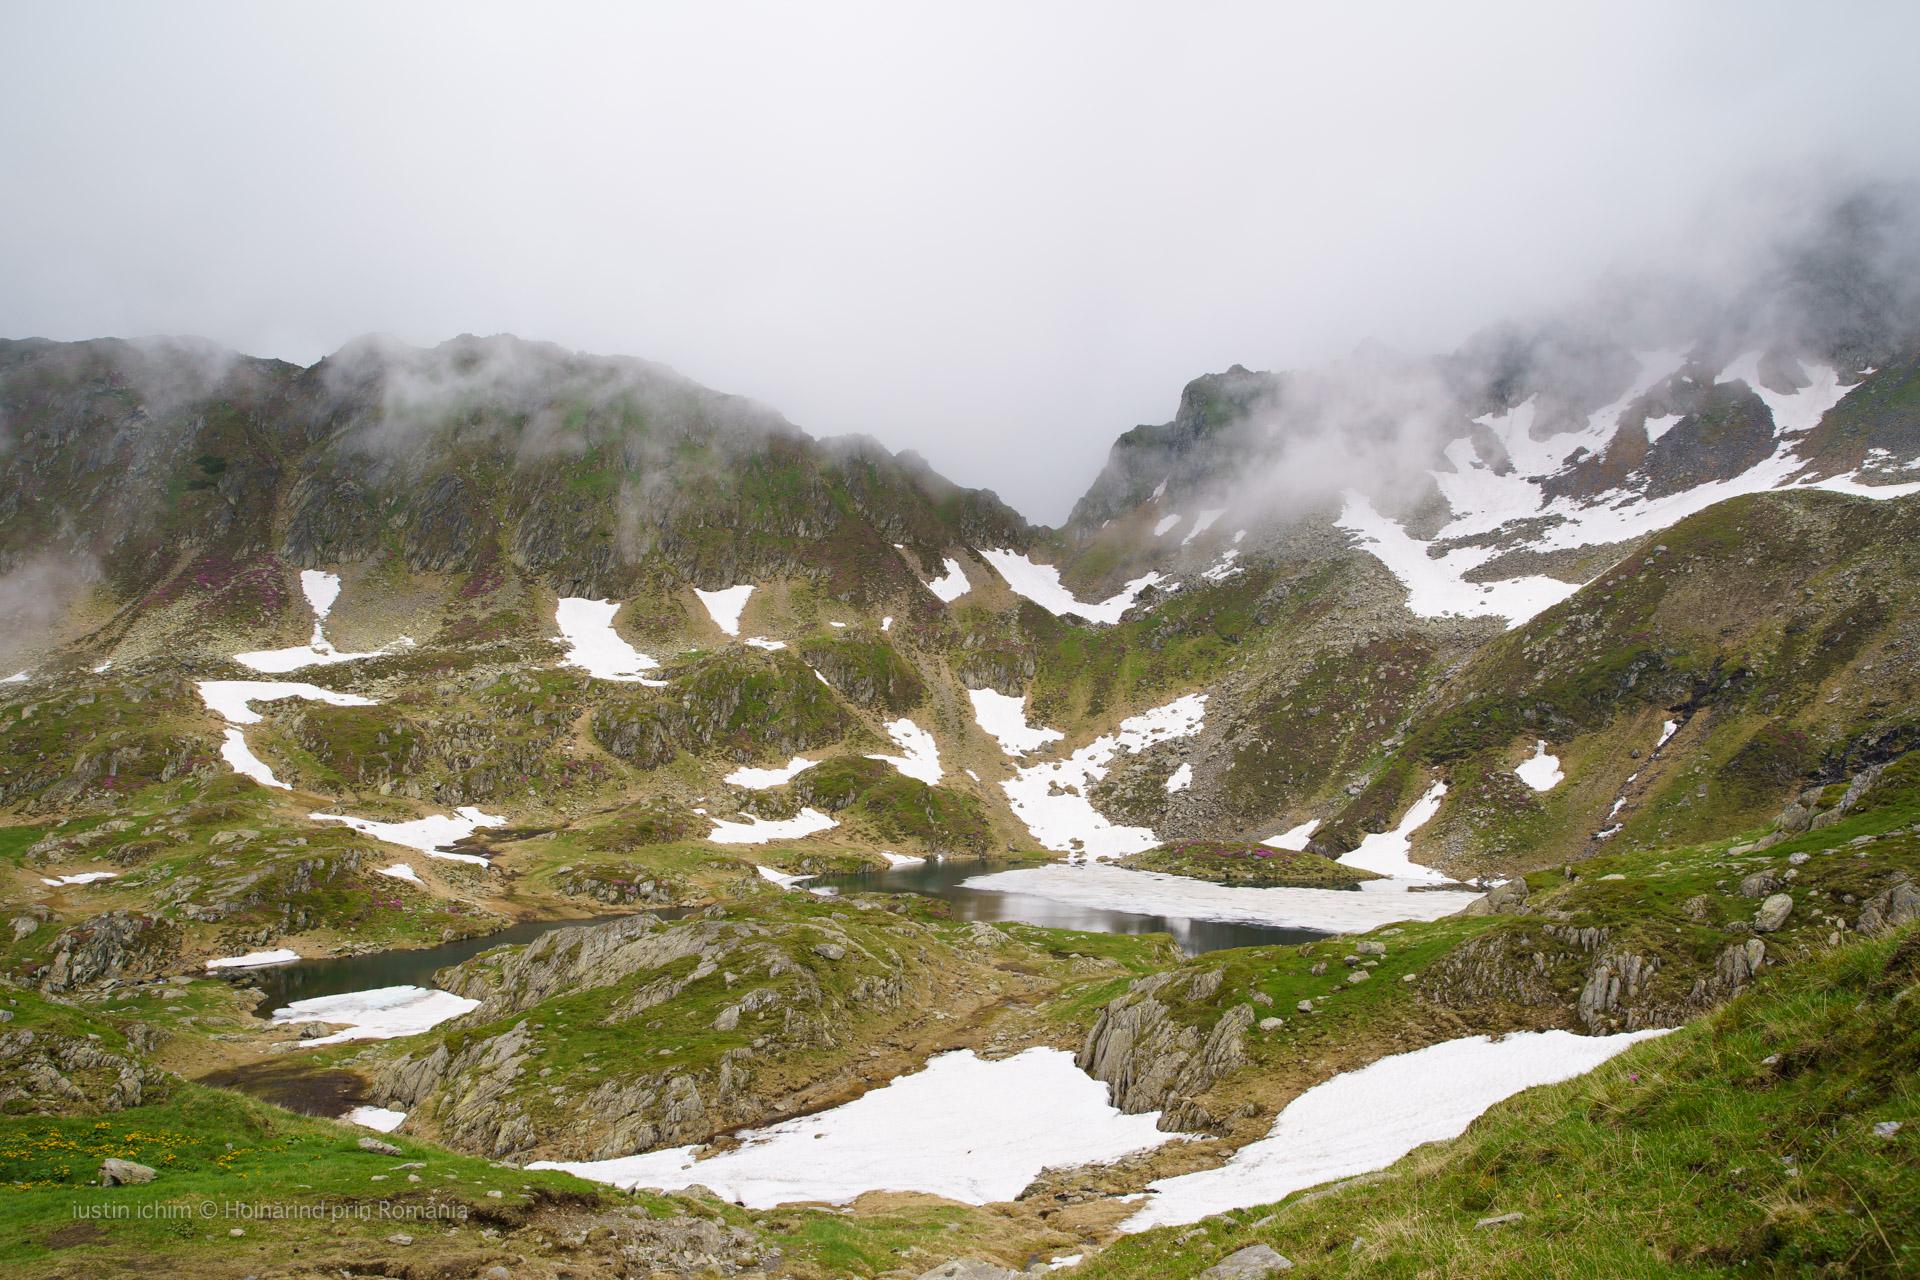 Munții Făgăraș, Cabana Podragu